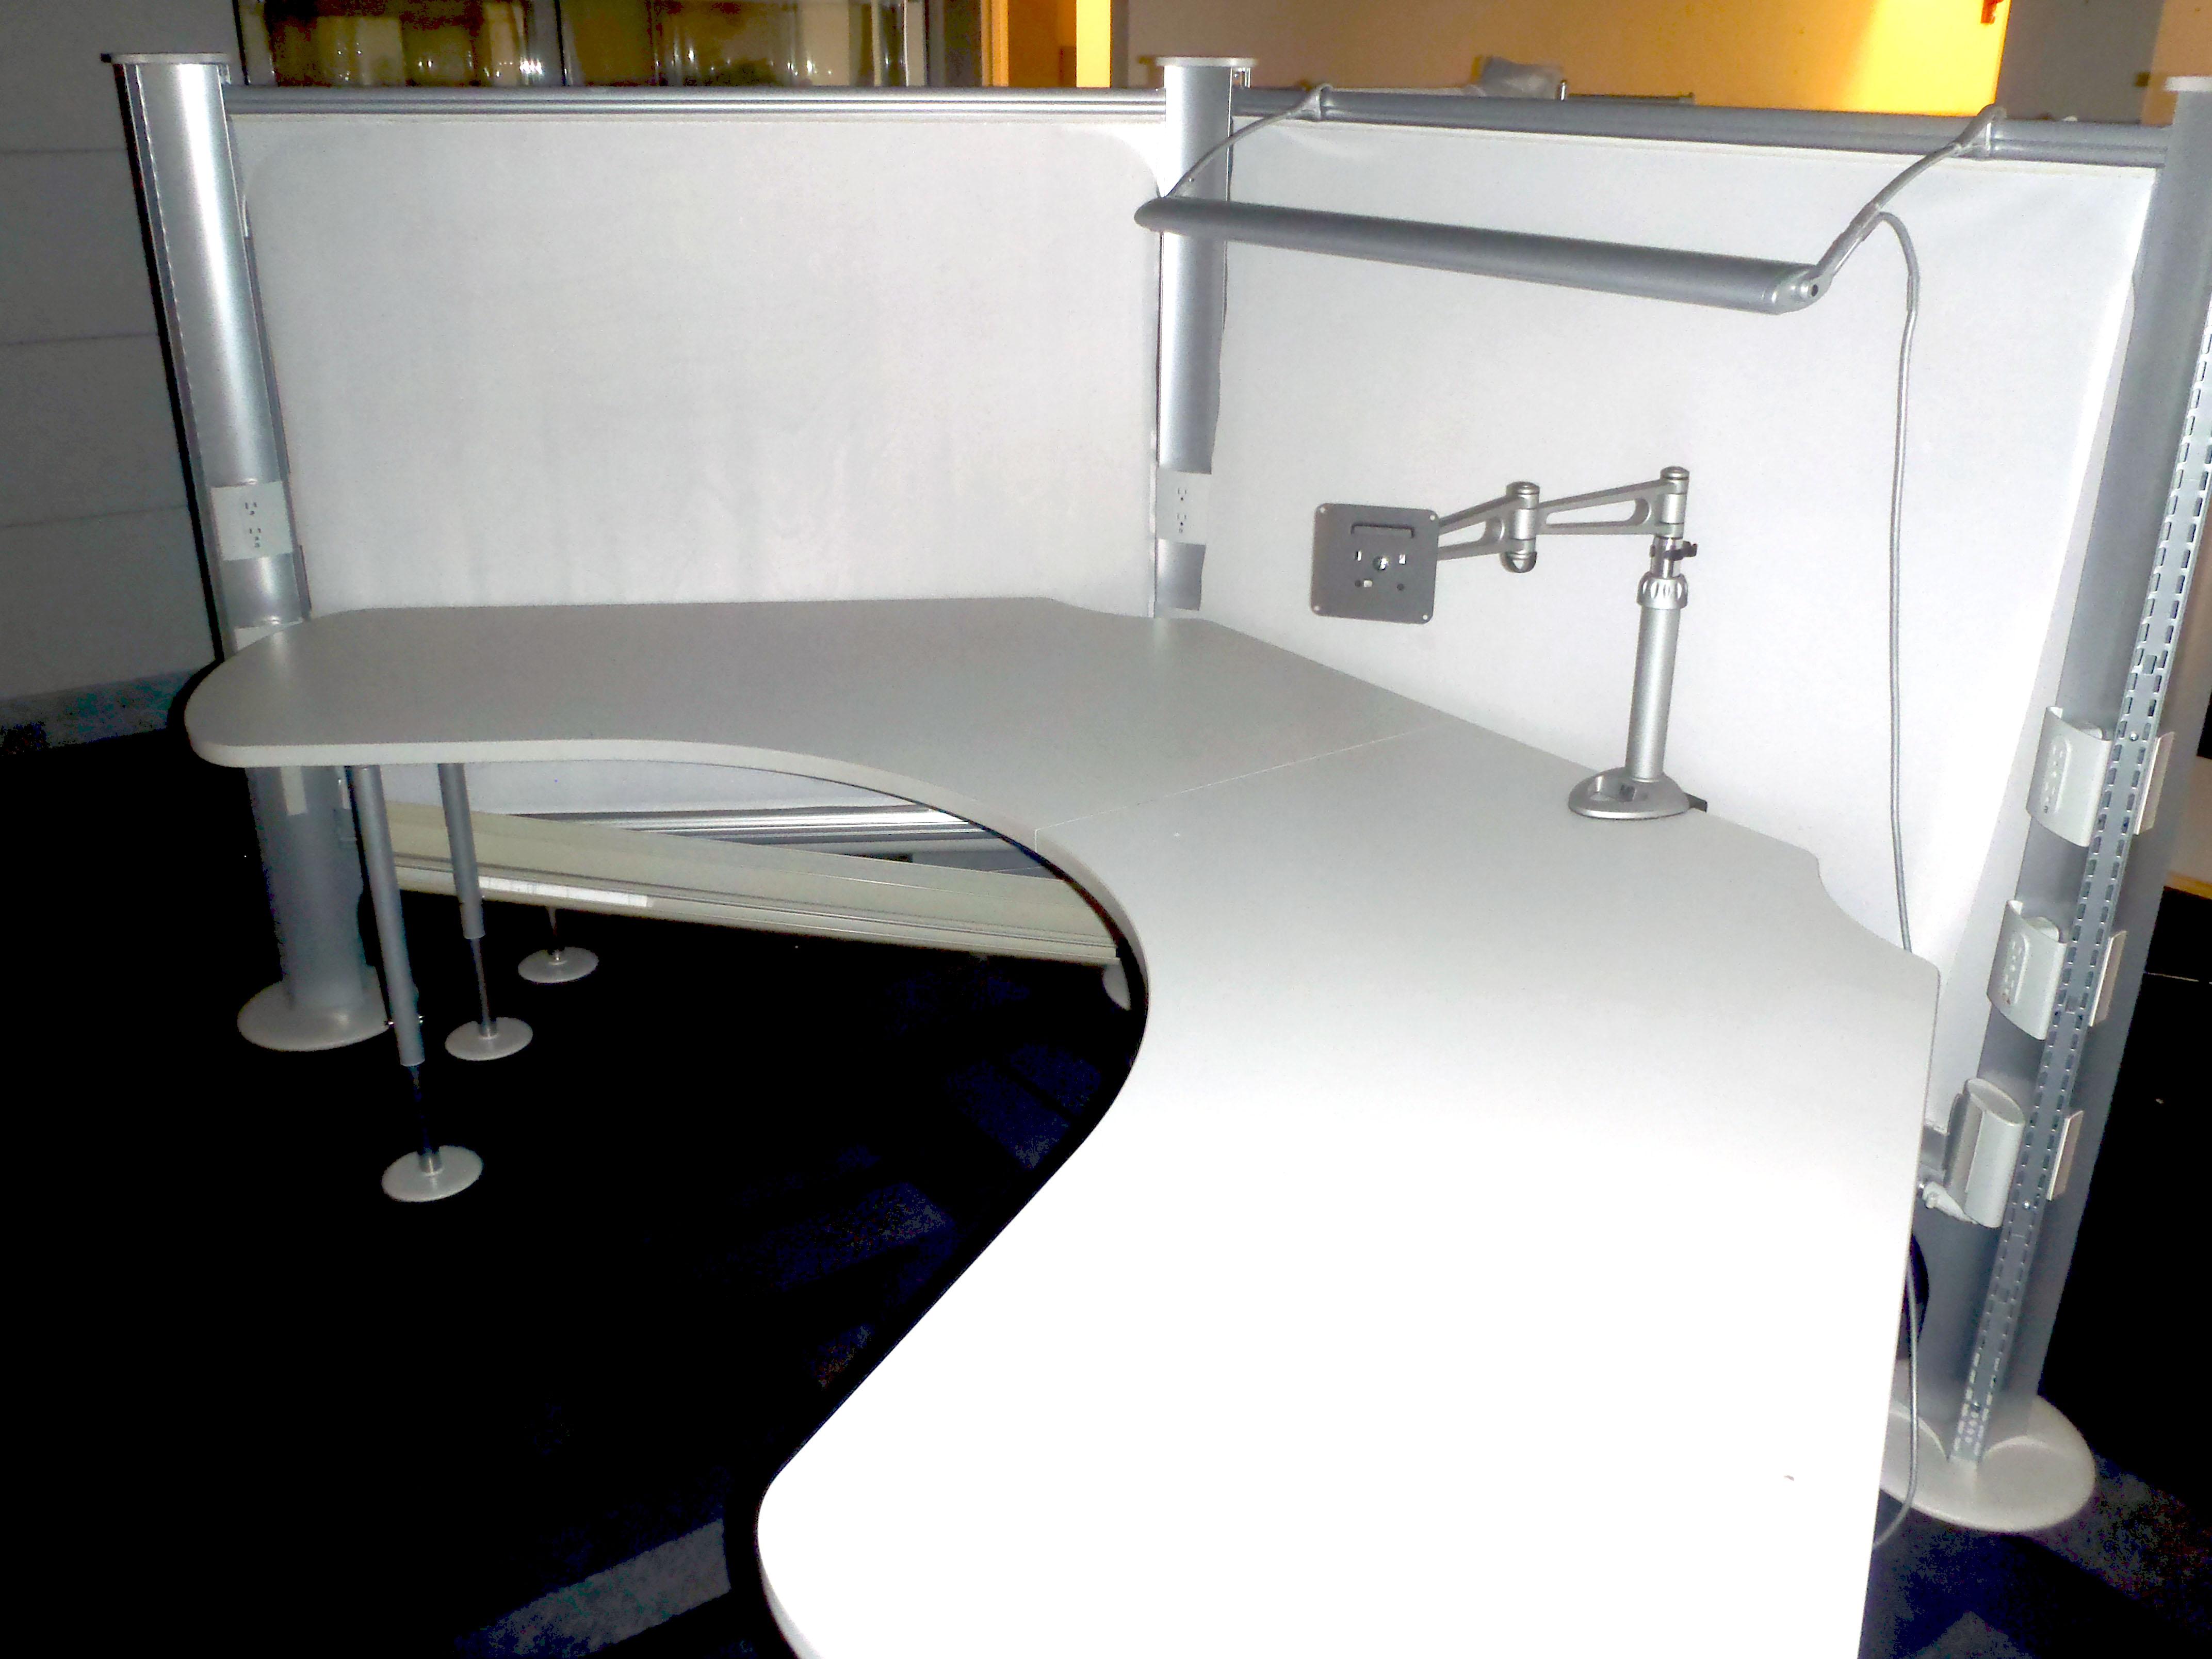 sofa cleaning nyc cost spinmaster marshmallow flip open disney frozen 9 herman miller resolve davena office furniture